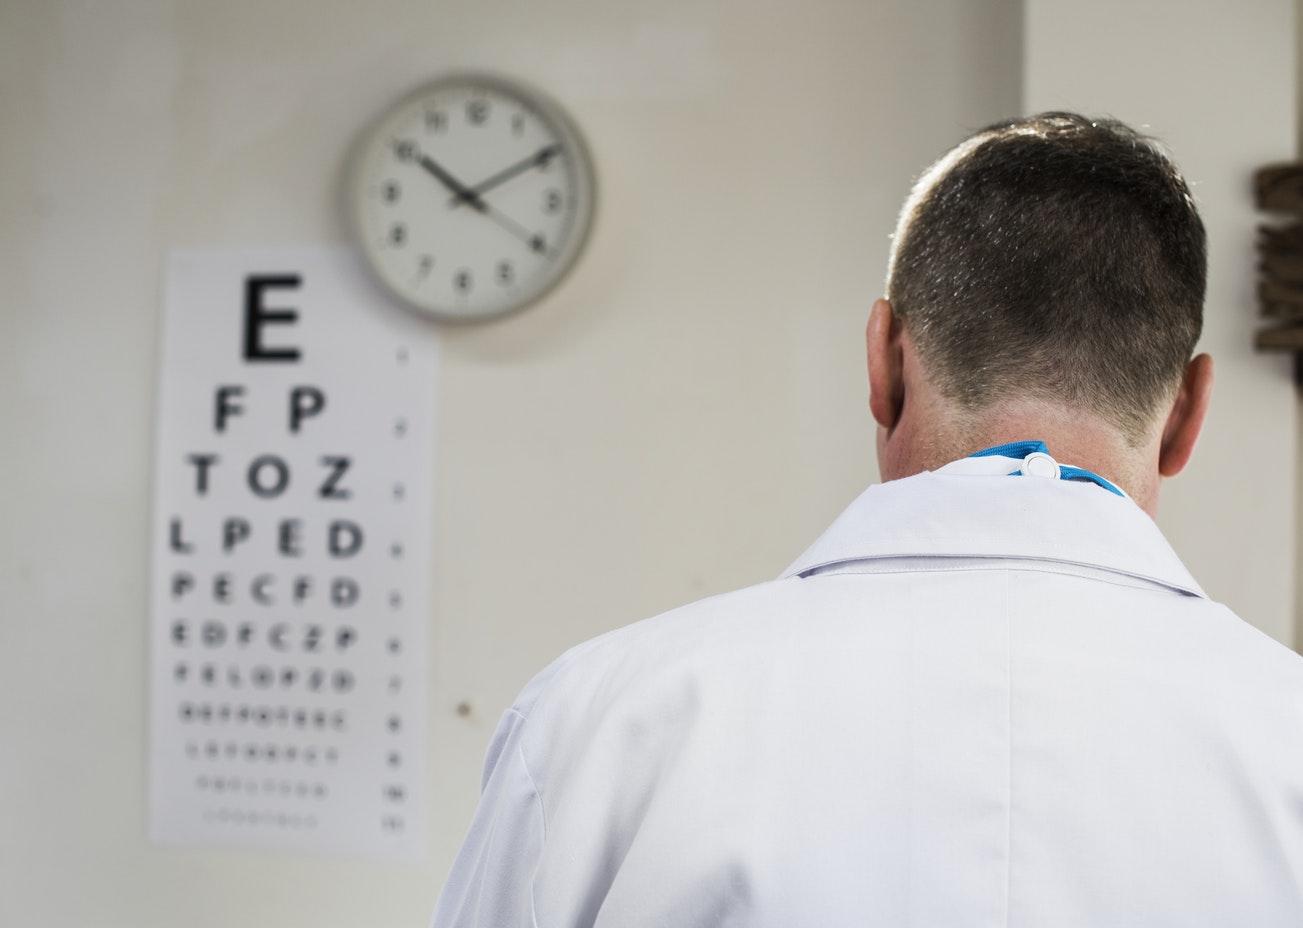 oftalmologista medicina